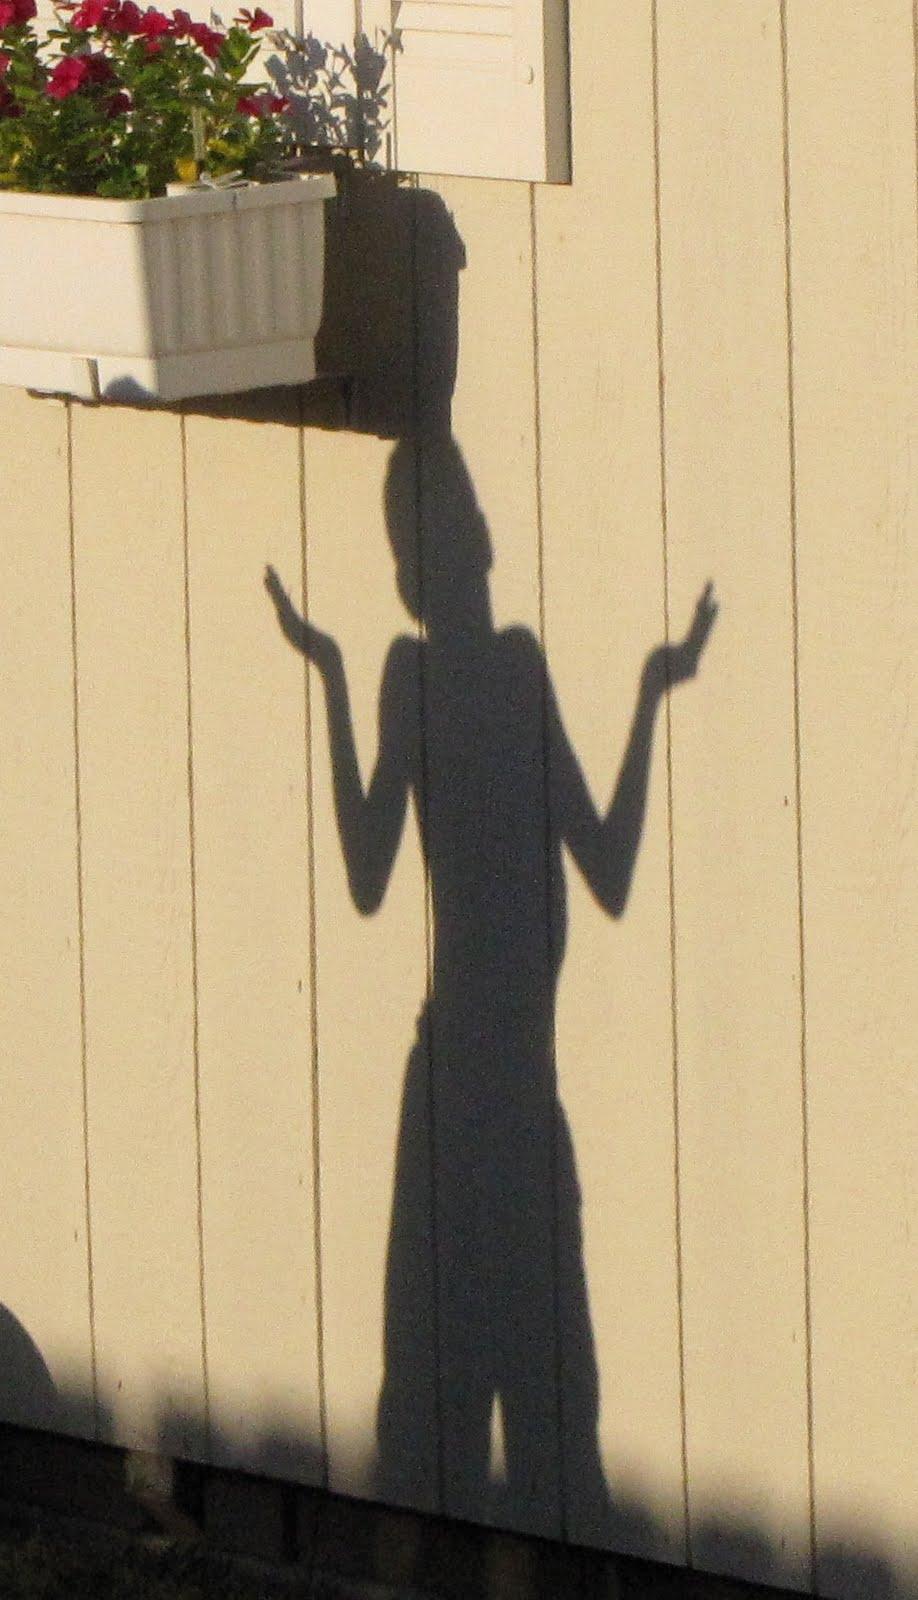 Rocks In The Washer: My Shadow Children